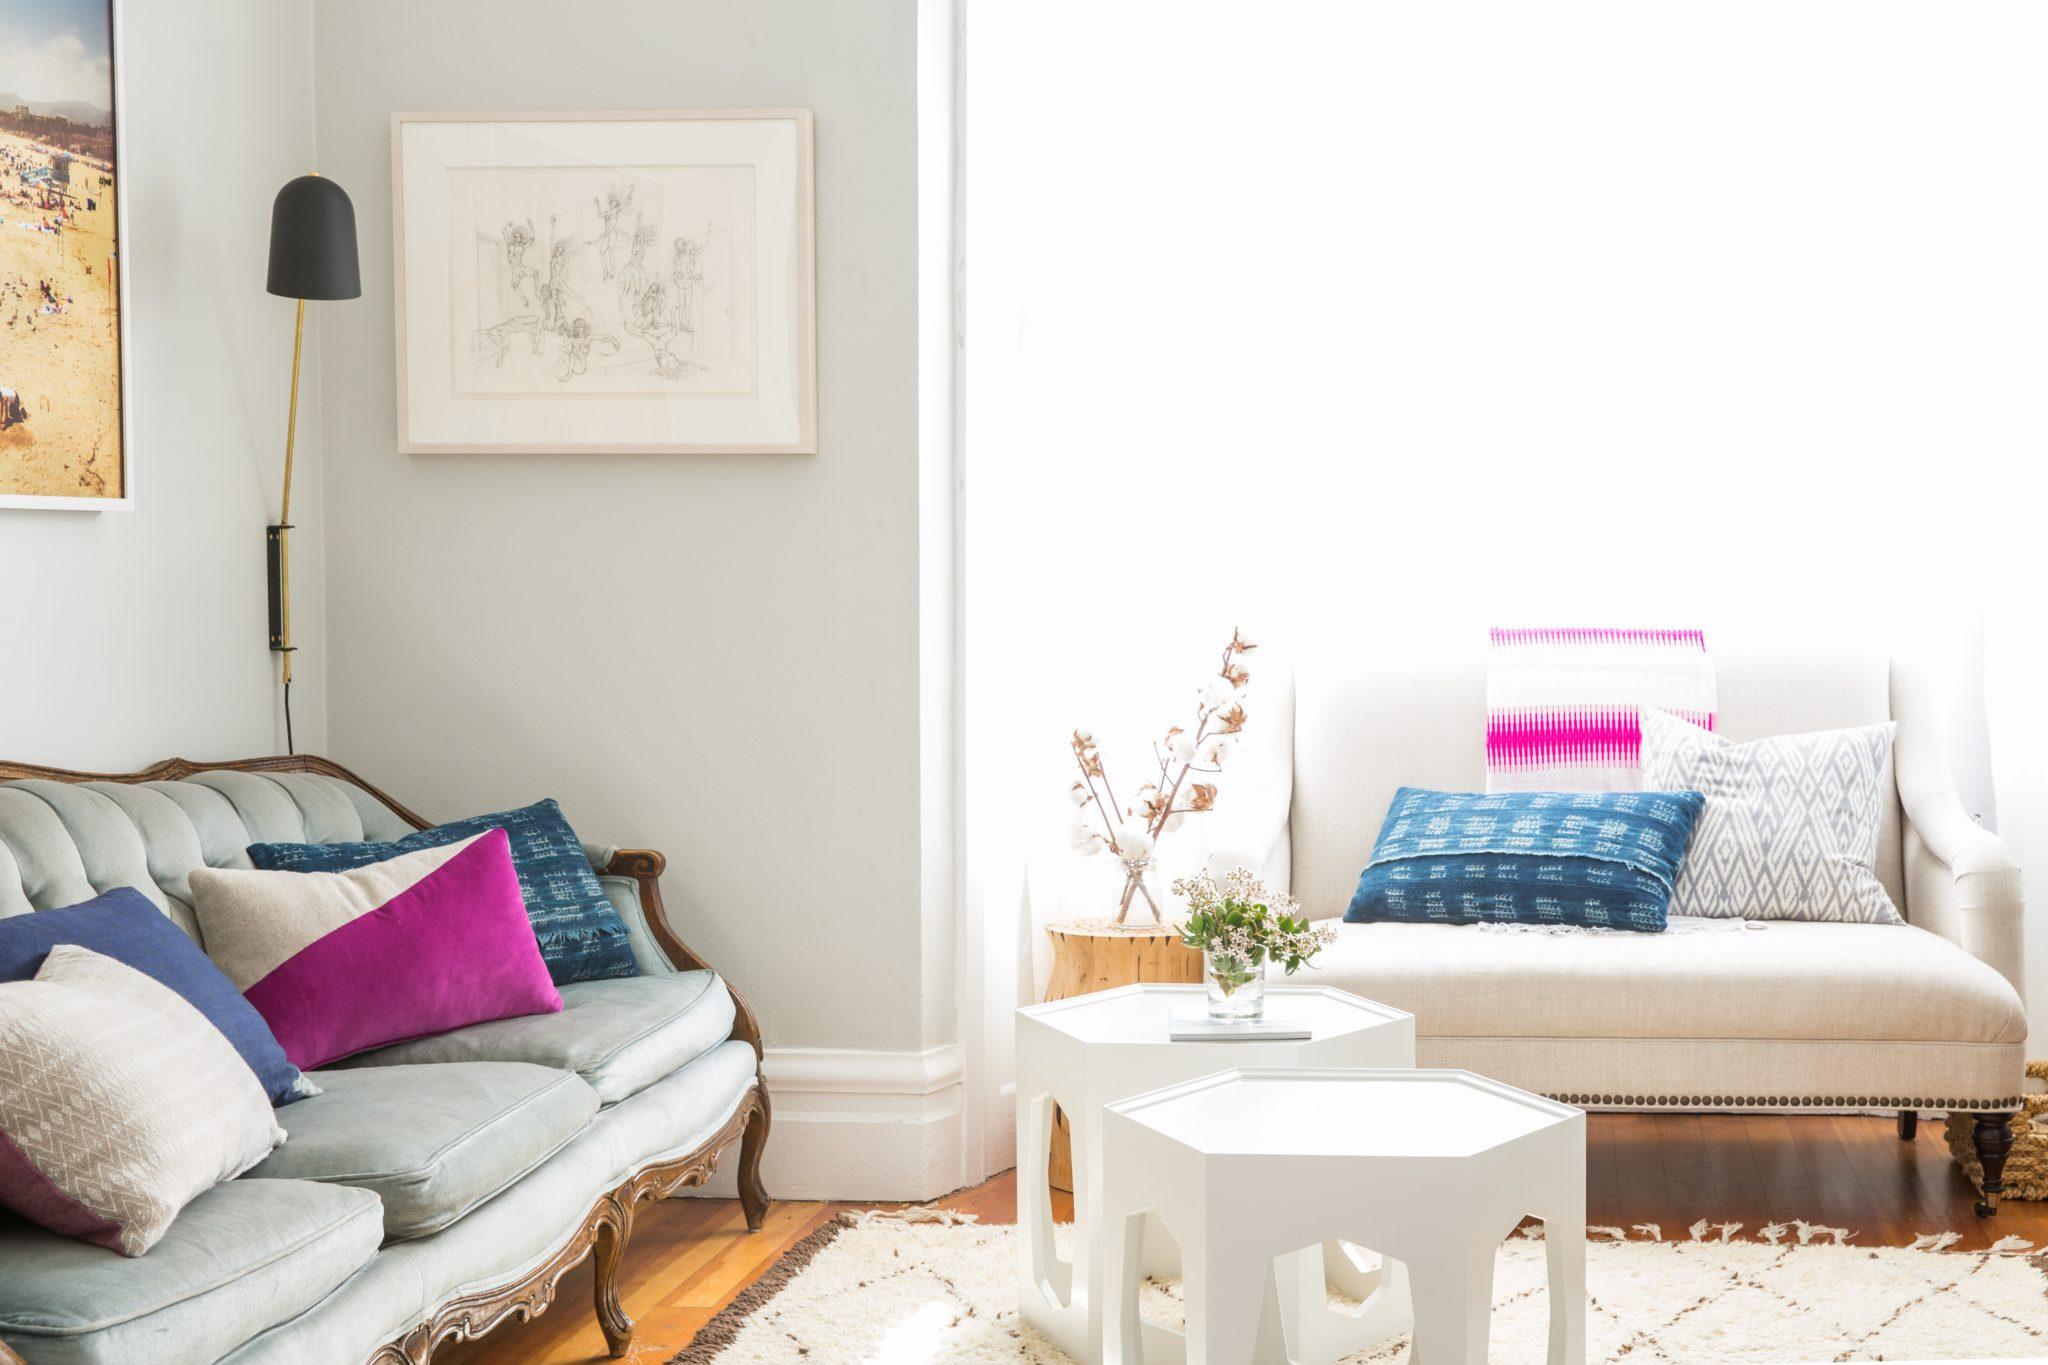 Mission Flat living room by Lauren Nelson Design